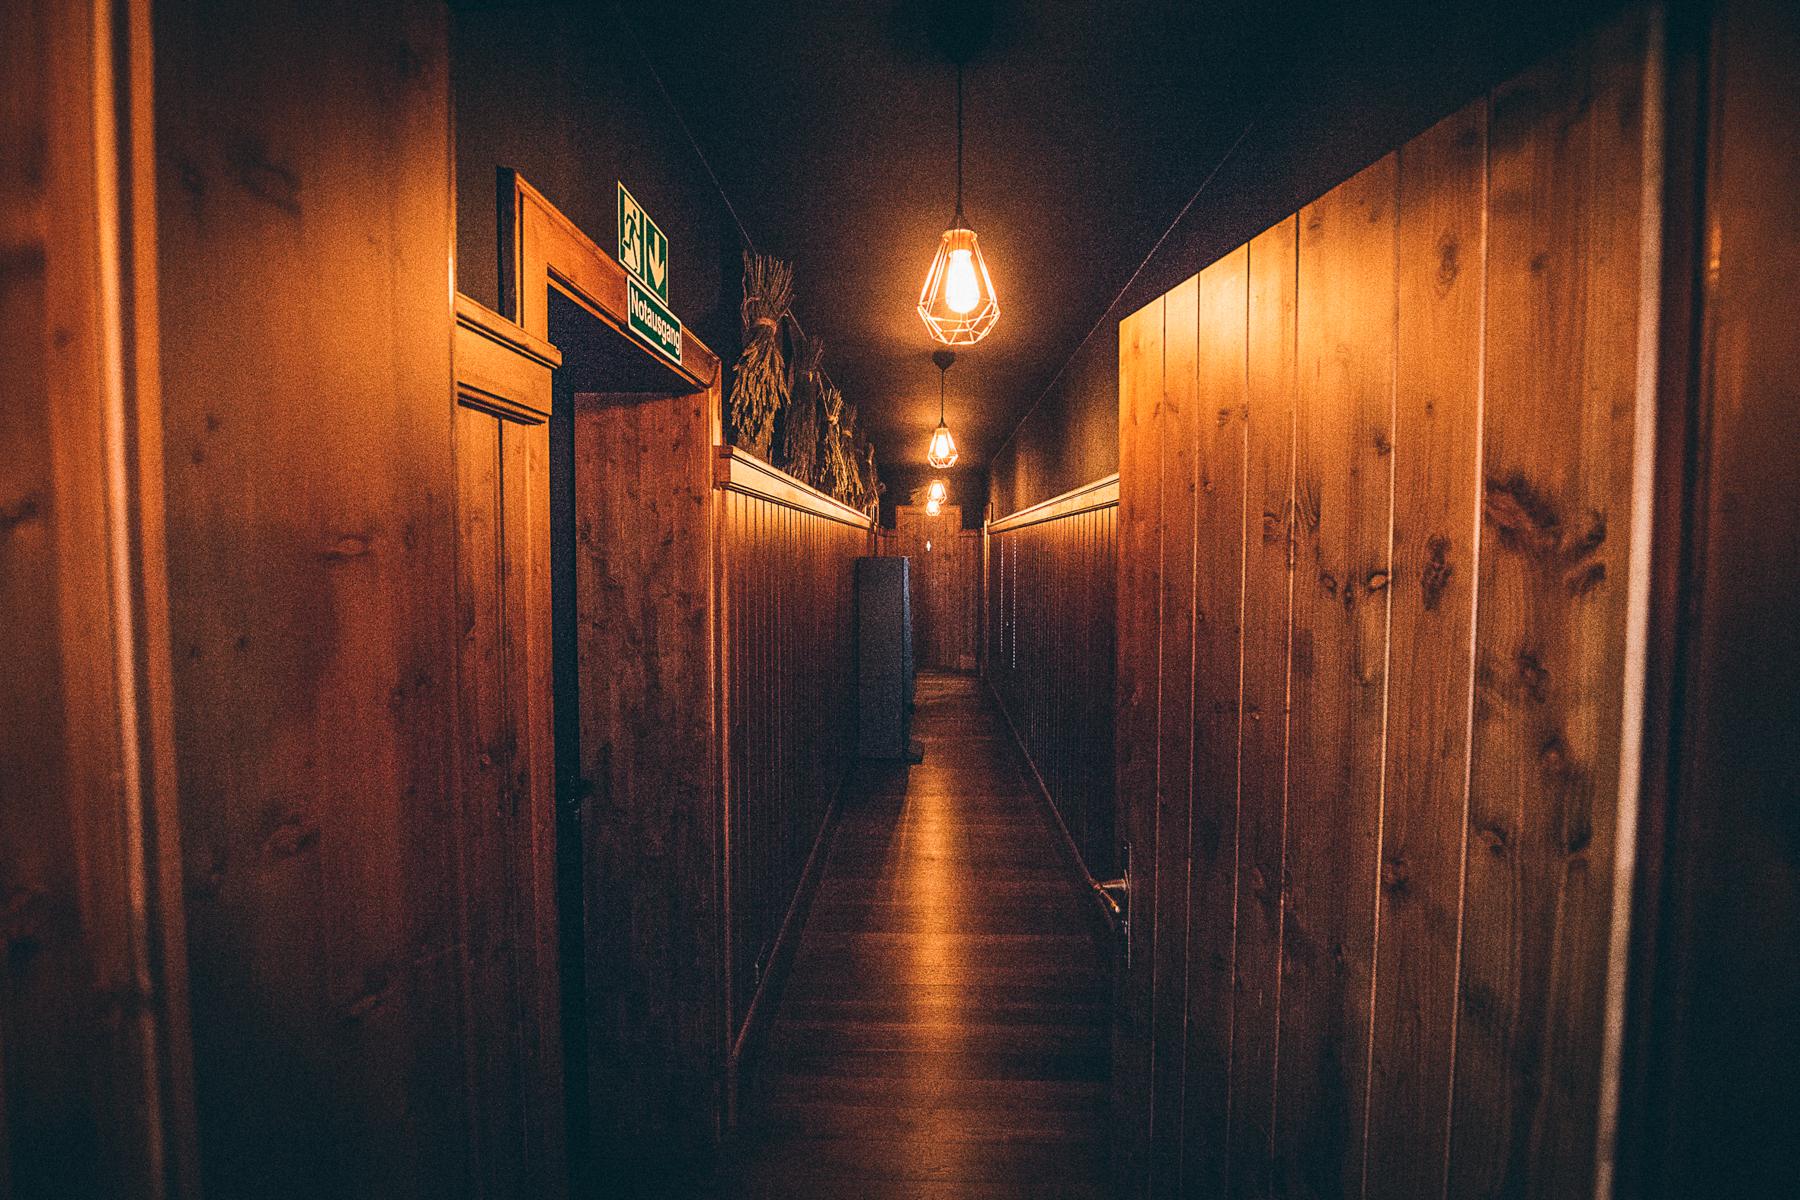 Holz in der Hütten.  – ©wunderland media GmbH